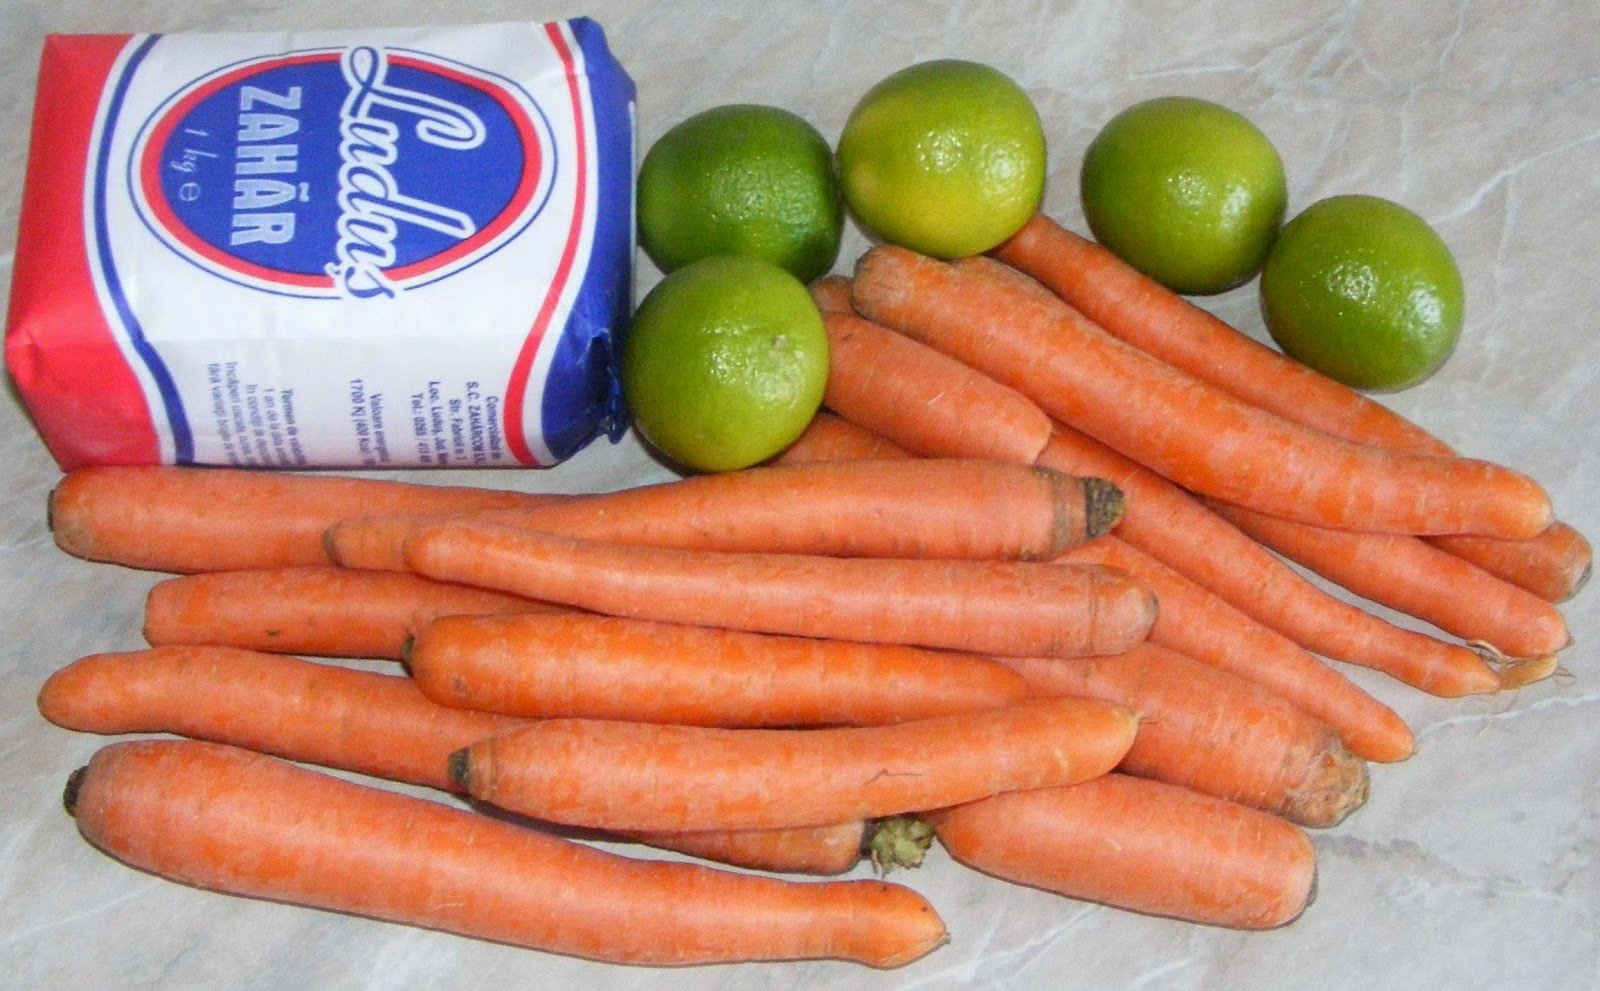 ingrediente dulceata de morcovi, cum se face dulceata de morcovi, cum facem dulceata de morcovi, cum se prepara dulceata de morcovi, retete si preparate culinare dulceata de morcovi, retete dulceata, reteta dulceata, retete cu morcovi, preparate din morcovi,